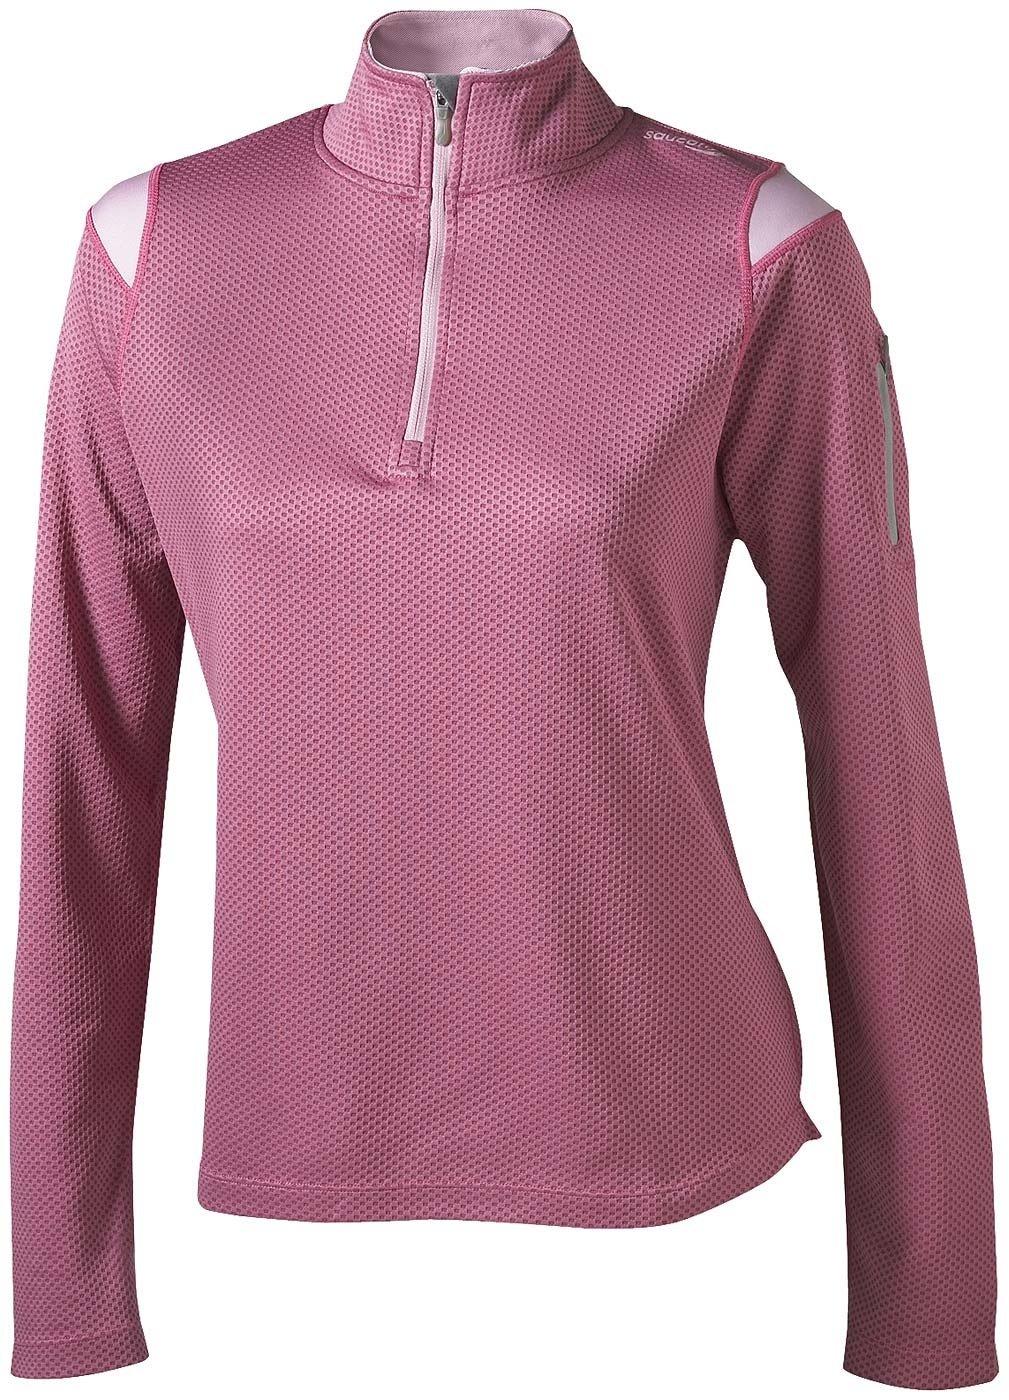 Saucony Optech Sportop, Camiseta de Running para Mujer